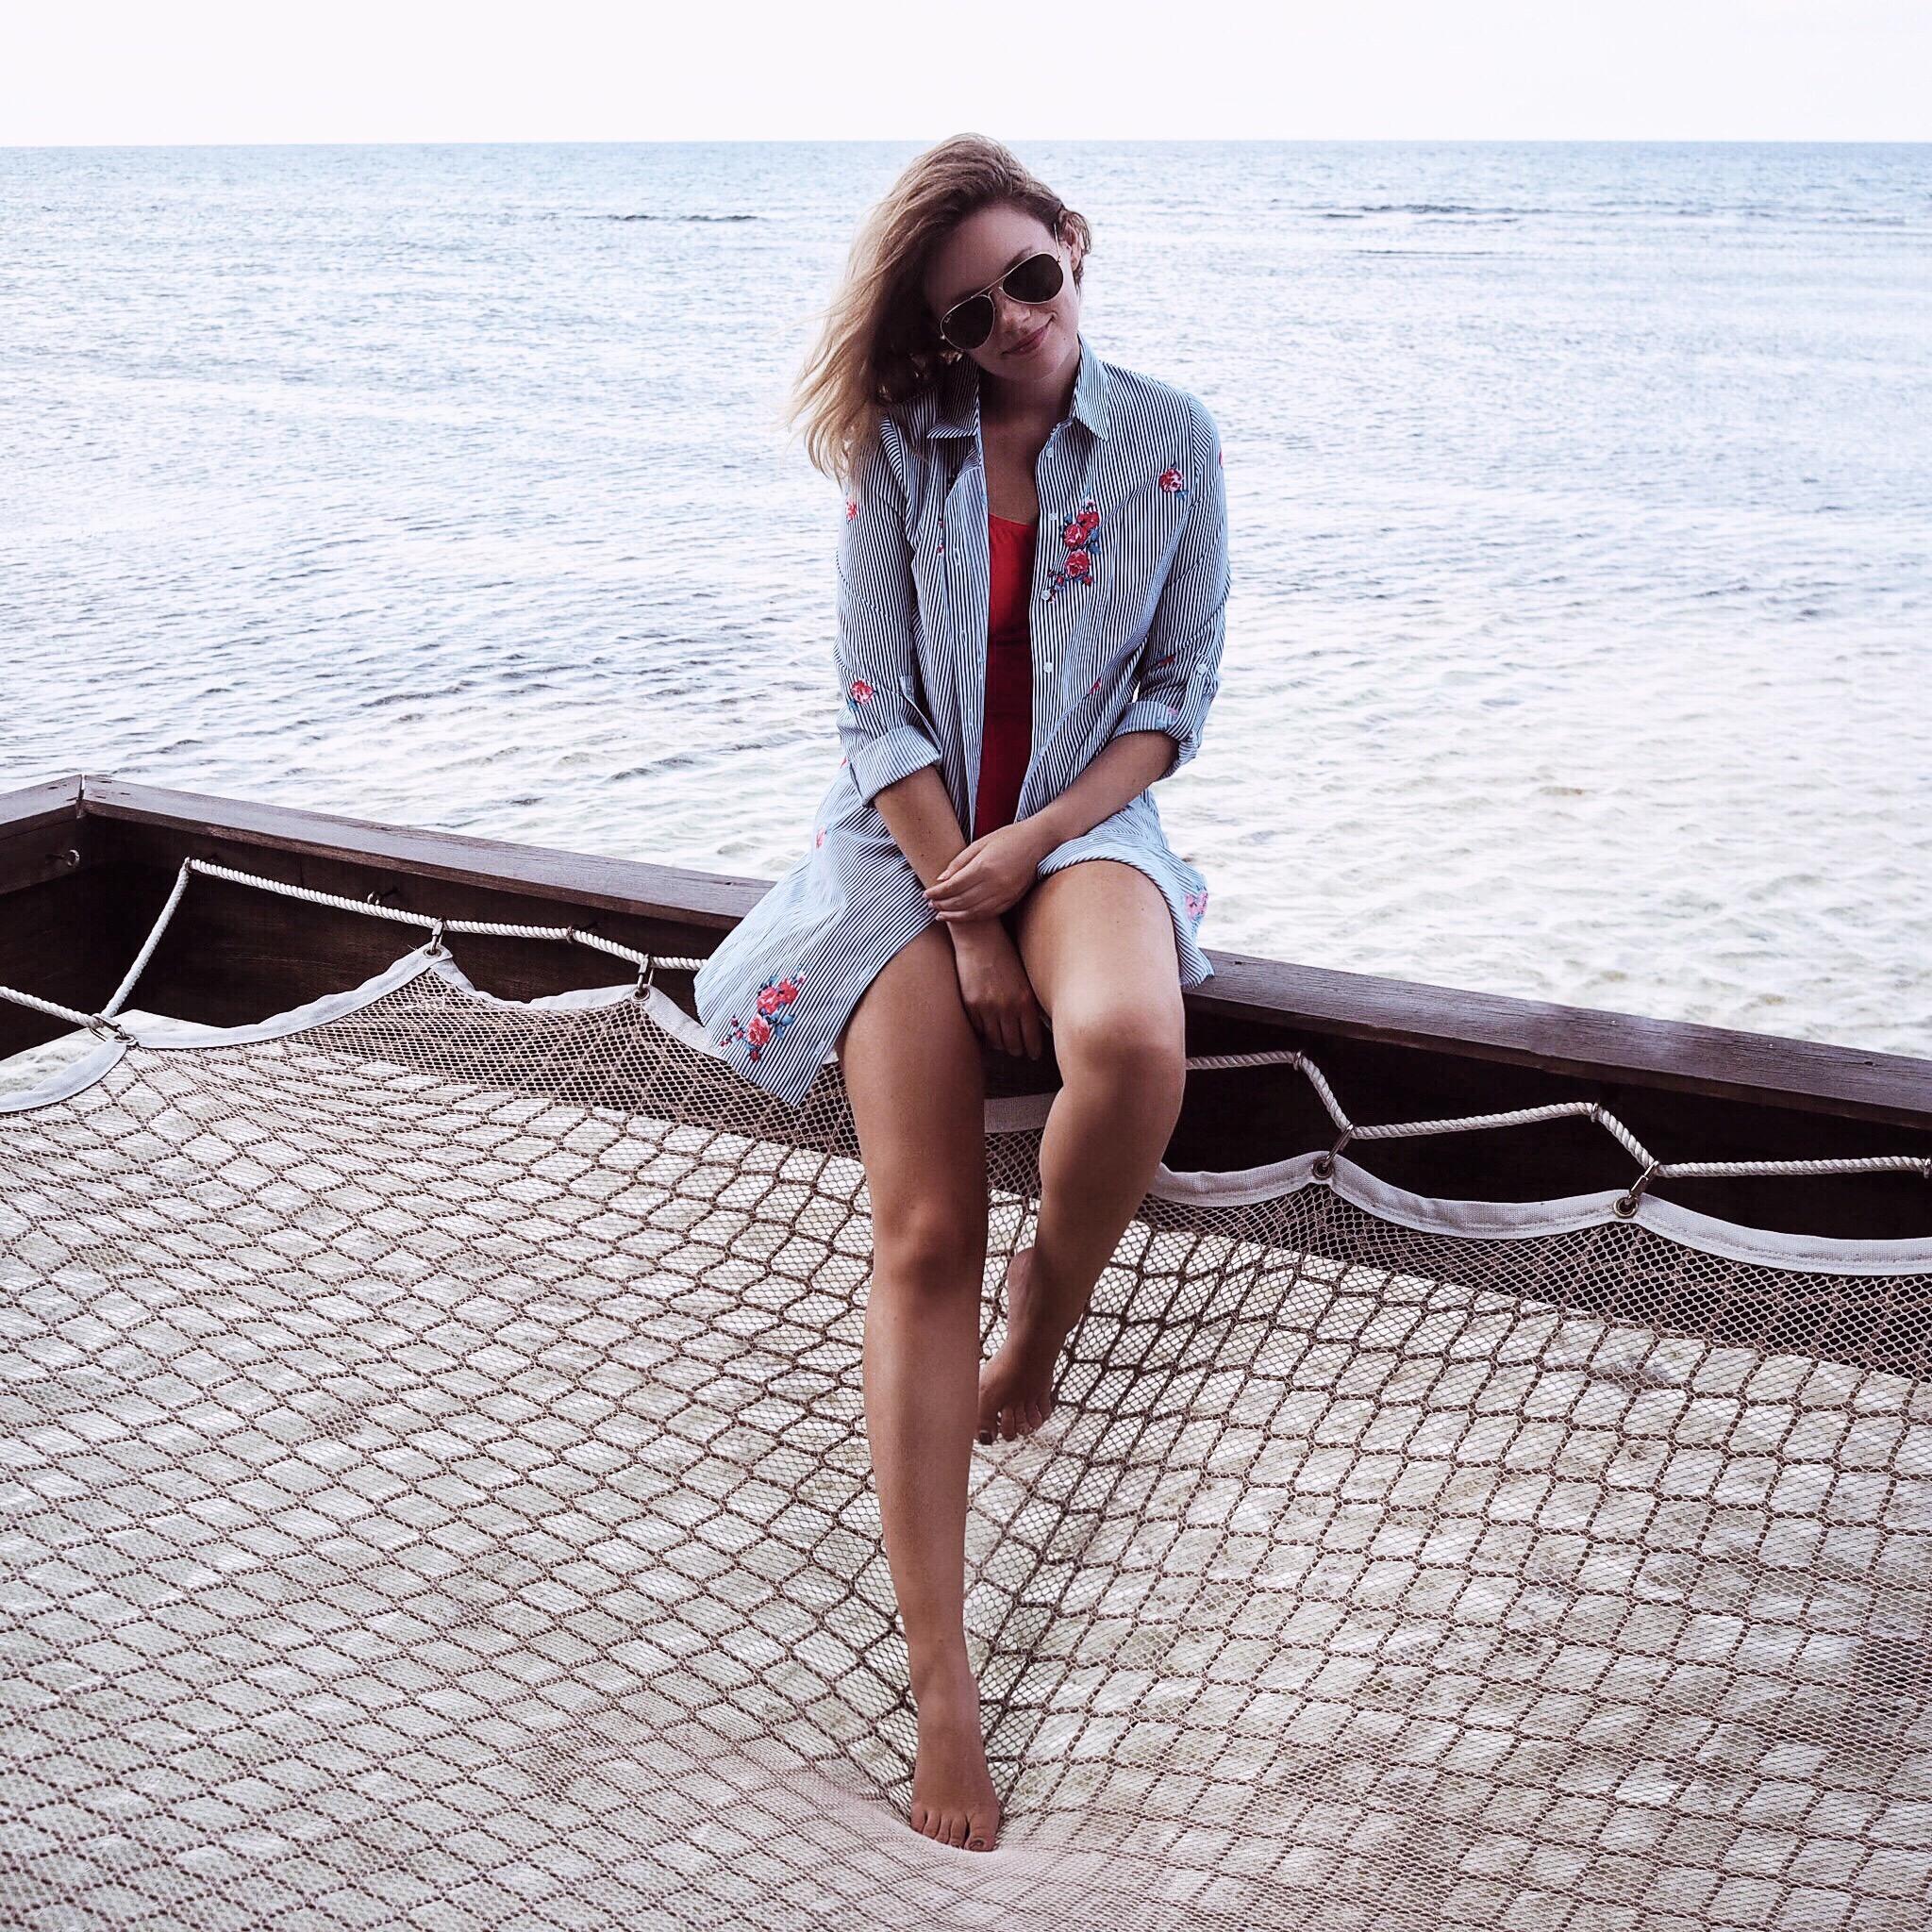 sandals resort montego bay jesschamilton primakr shirt